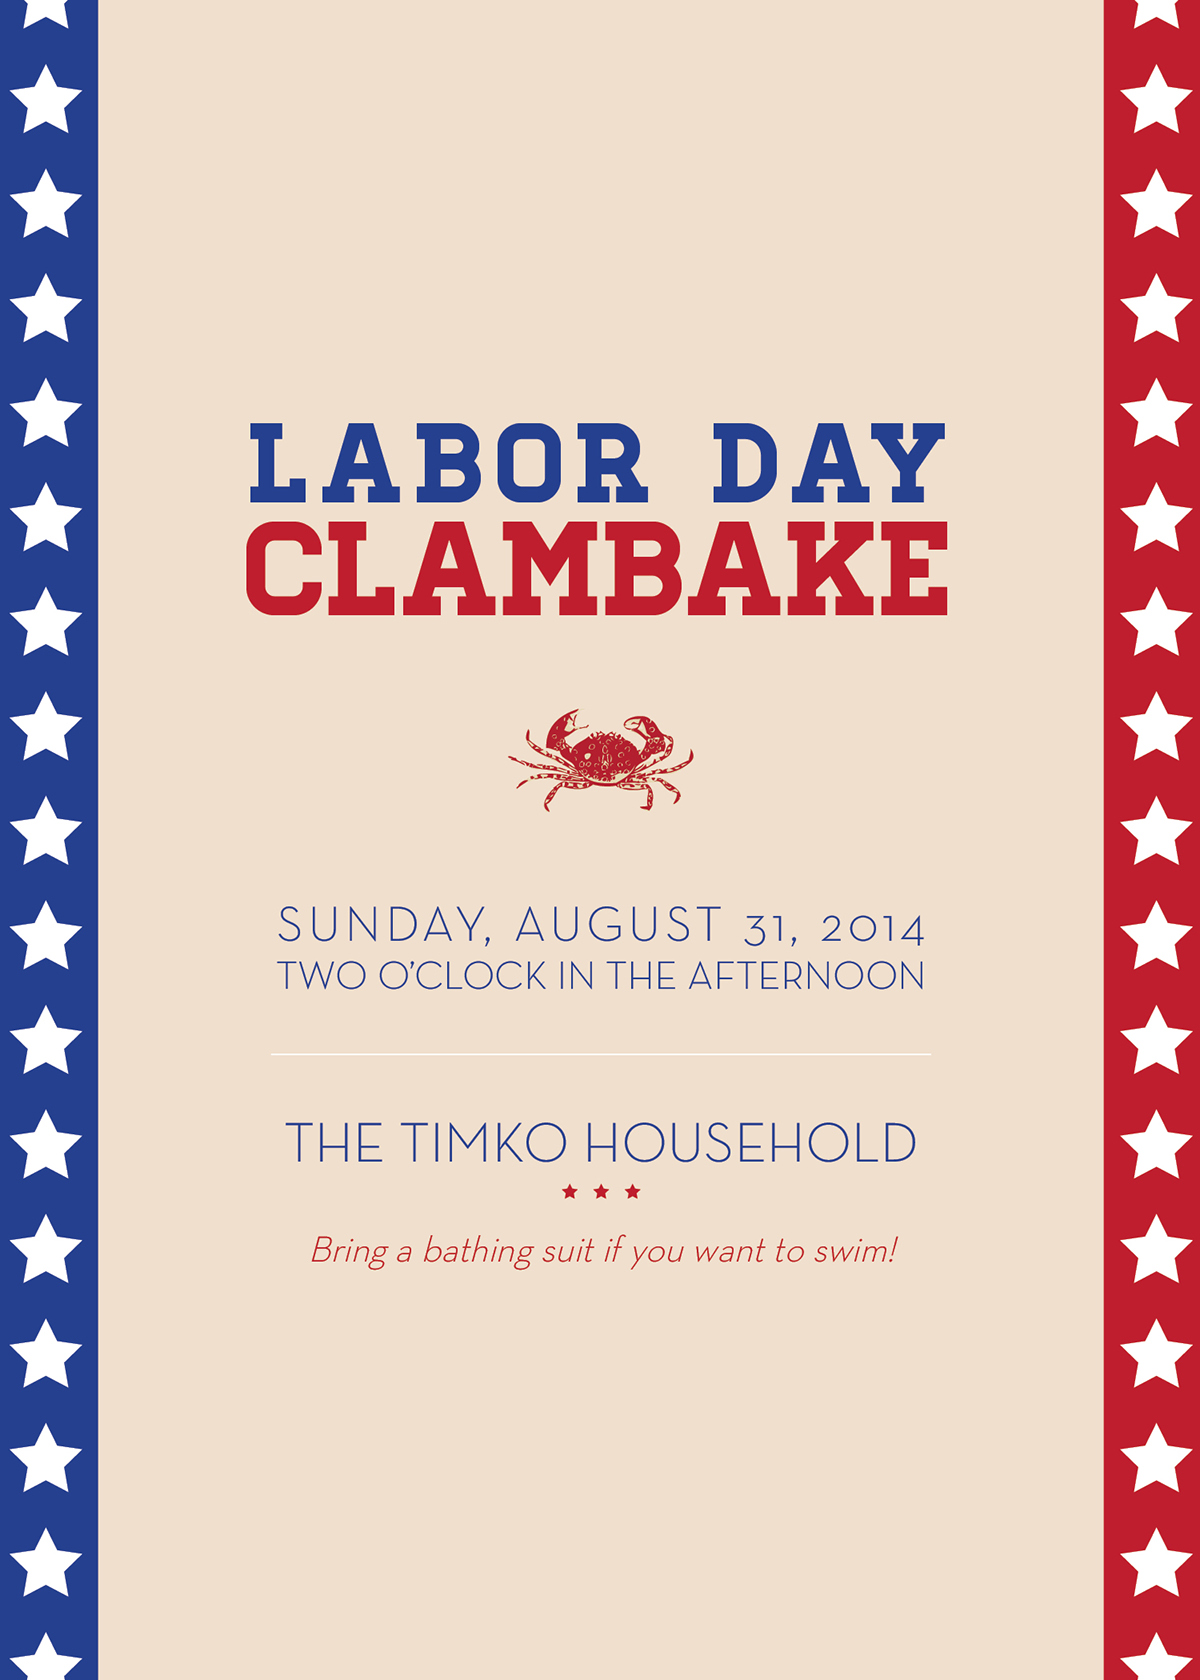 Labor Day Clam Bake Invitation On Behance